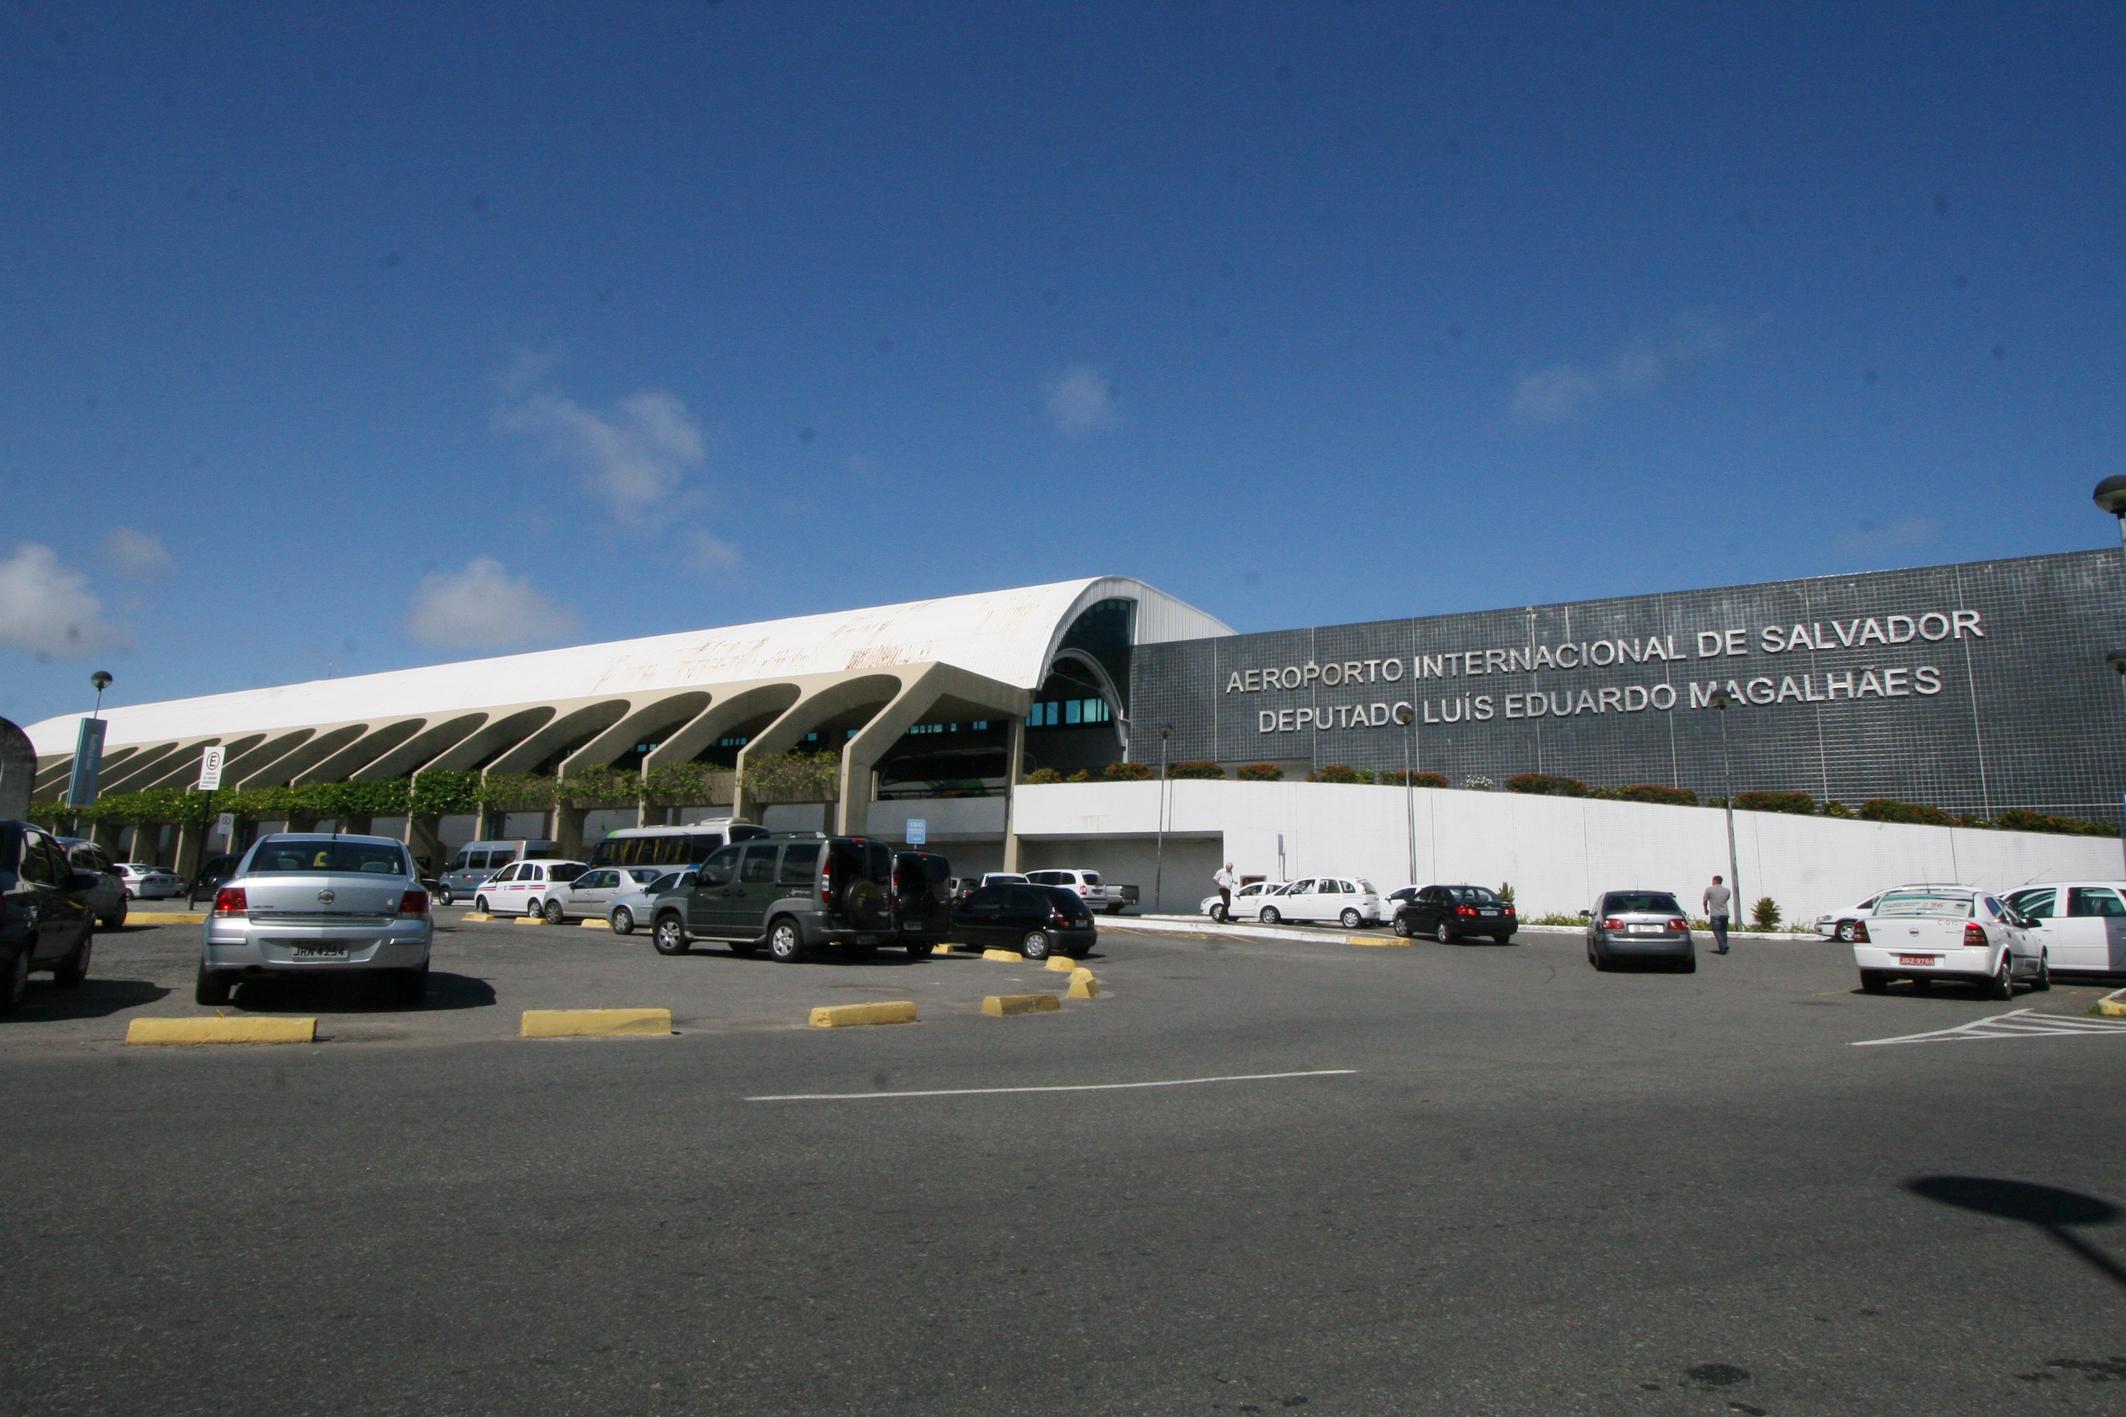 Aeroporto De Salvador : File fachada aeroporto de salvador g wikimedia commons